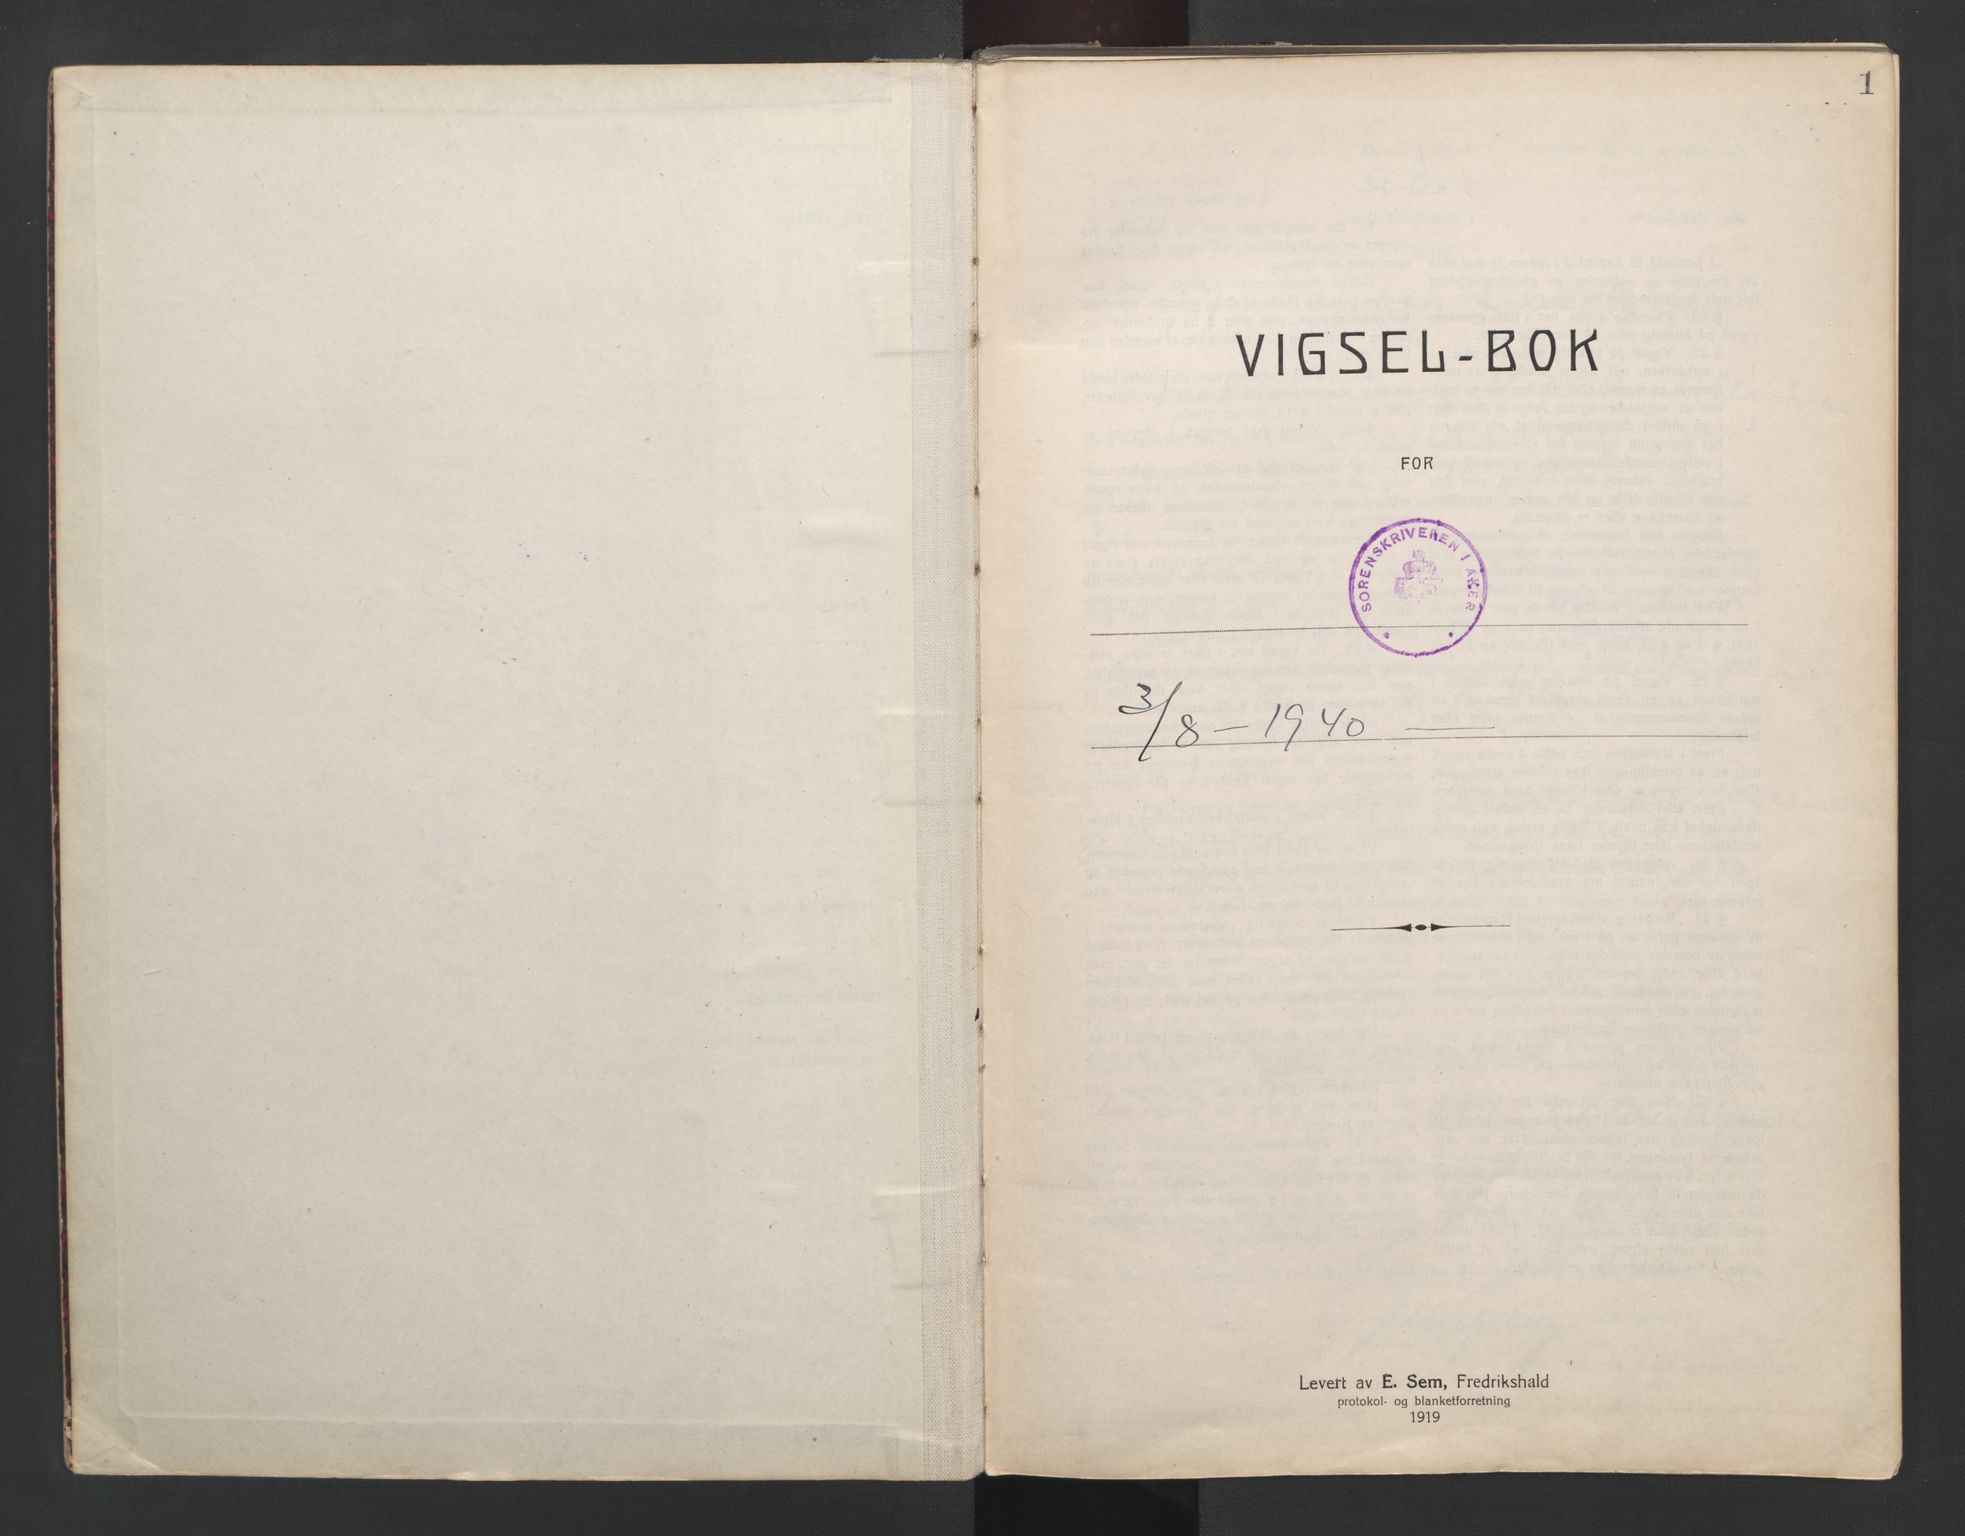 SAO, Aker sorenskriveri, L/Lc/Lcb/L0013: Vigselprotokoll, 1940-1941, s. 1